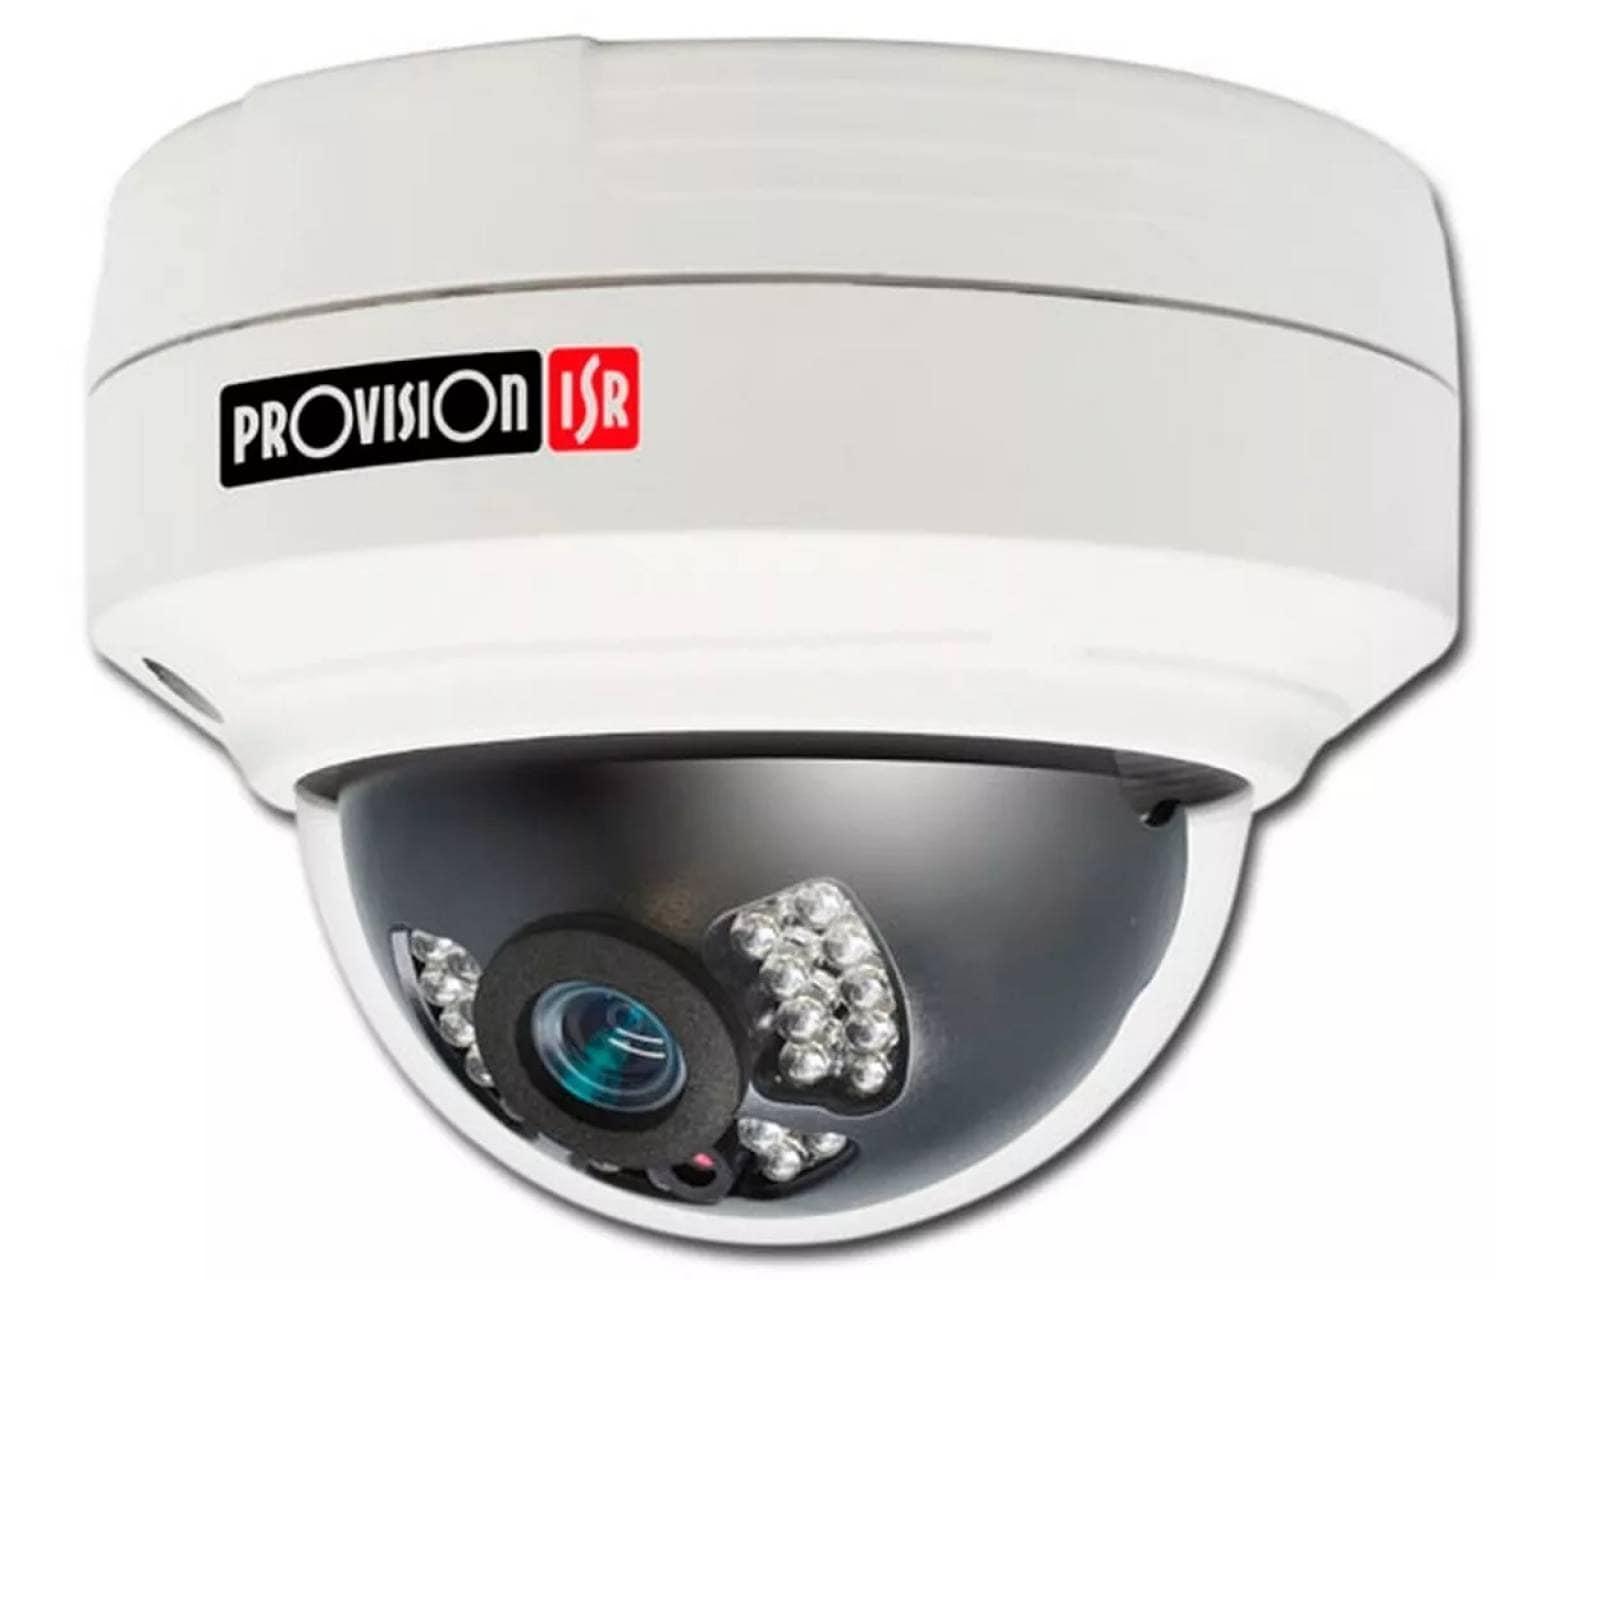 Camara De Vigilancia Provision Dai-380ip04 Antivandalismo